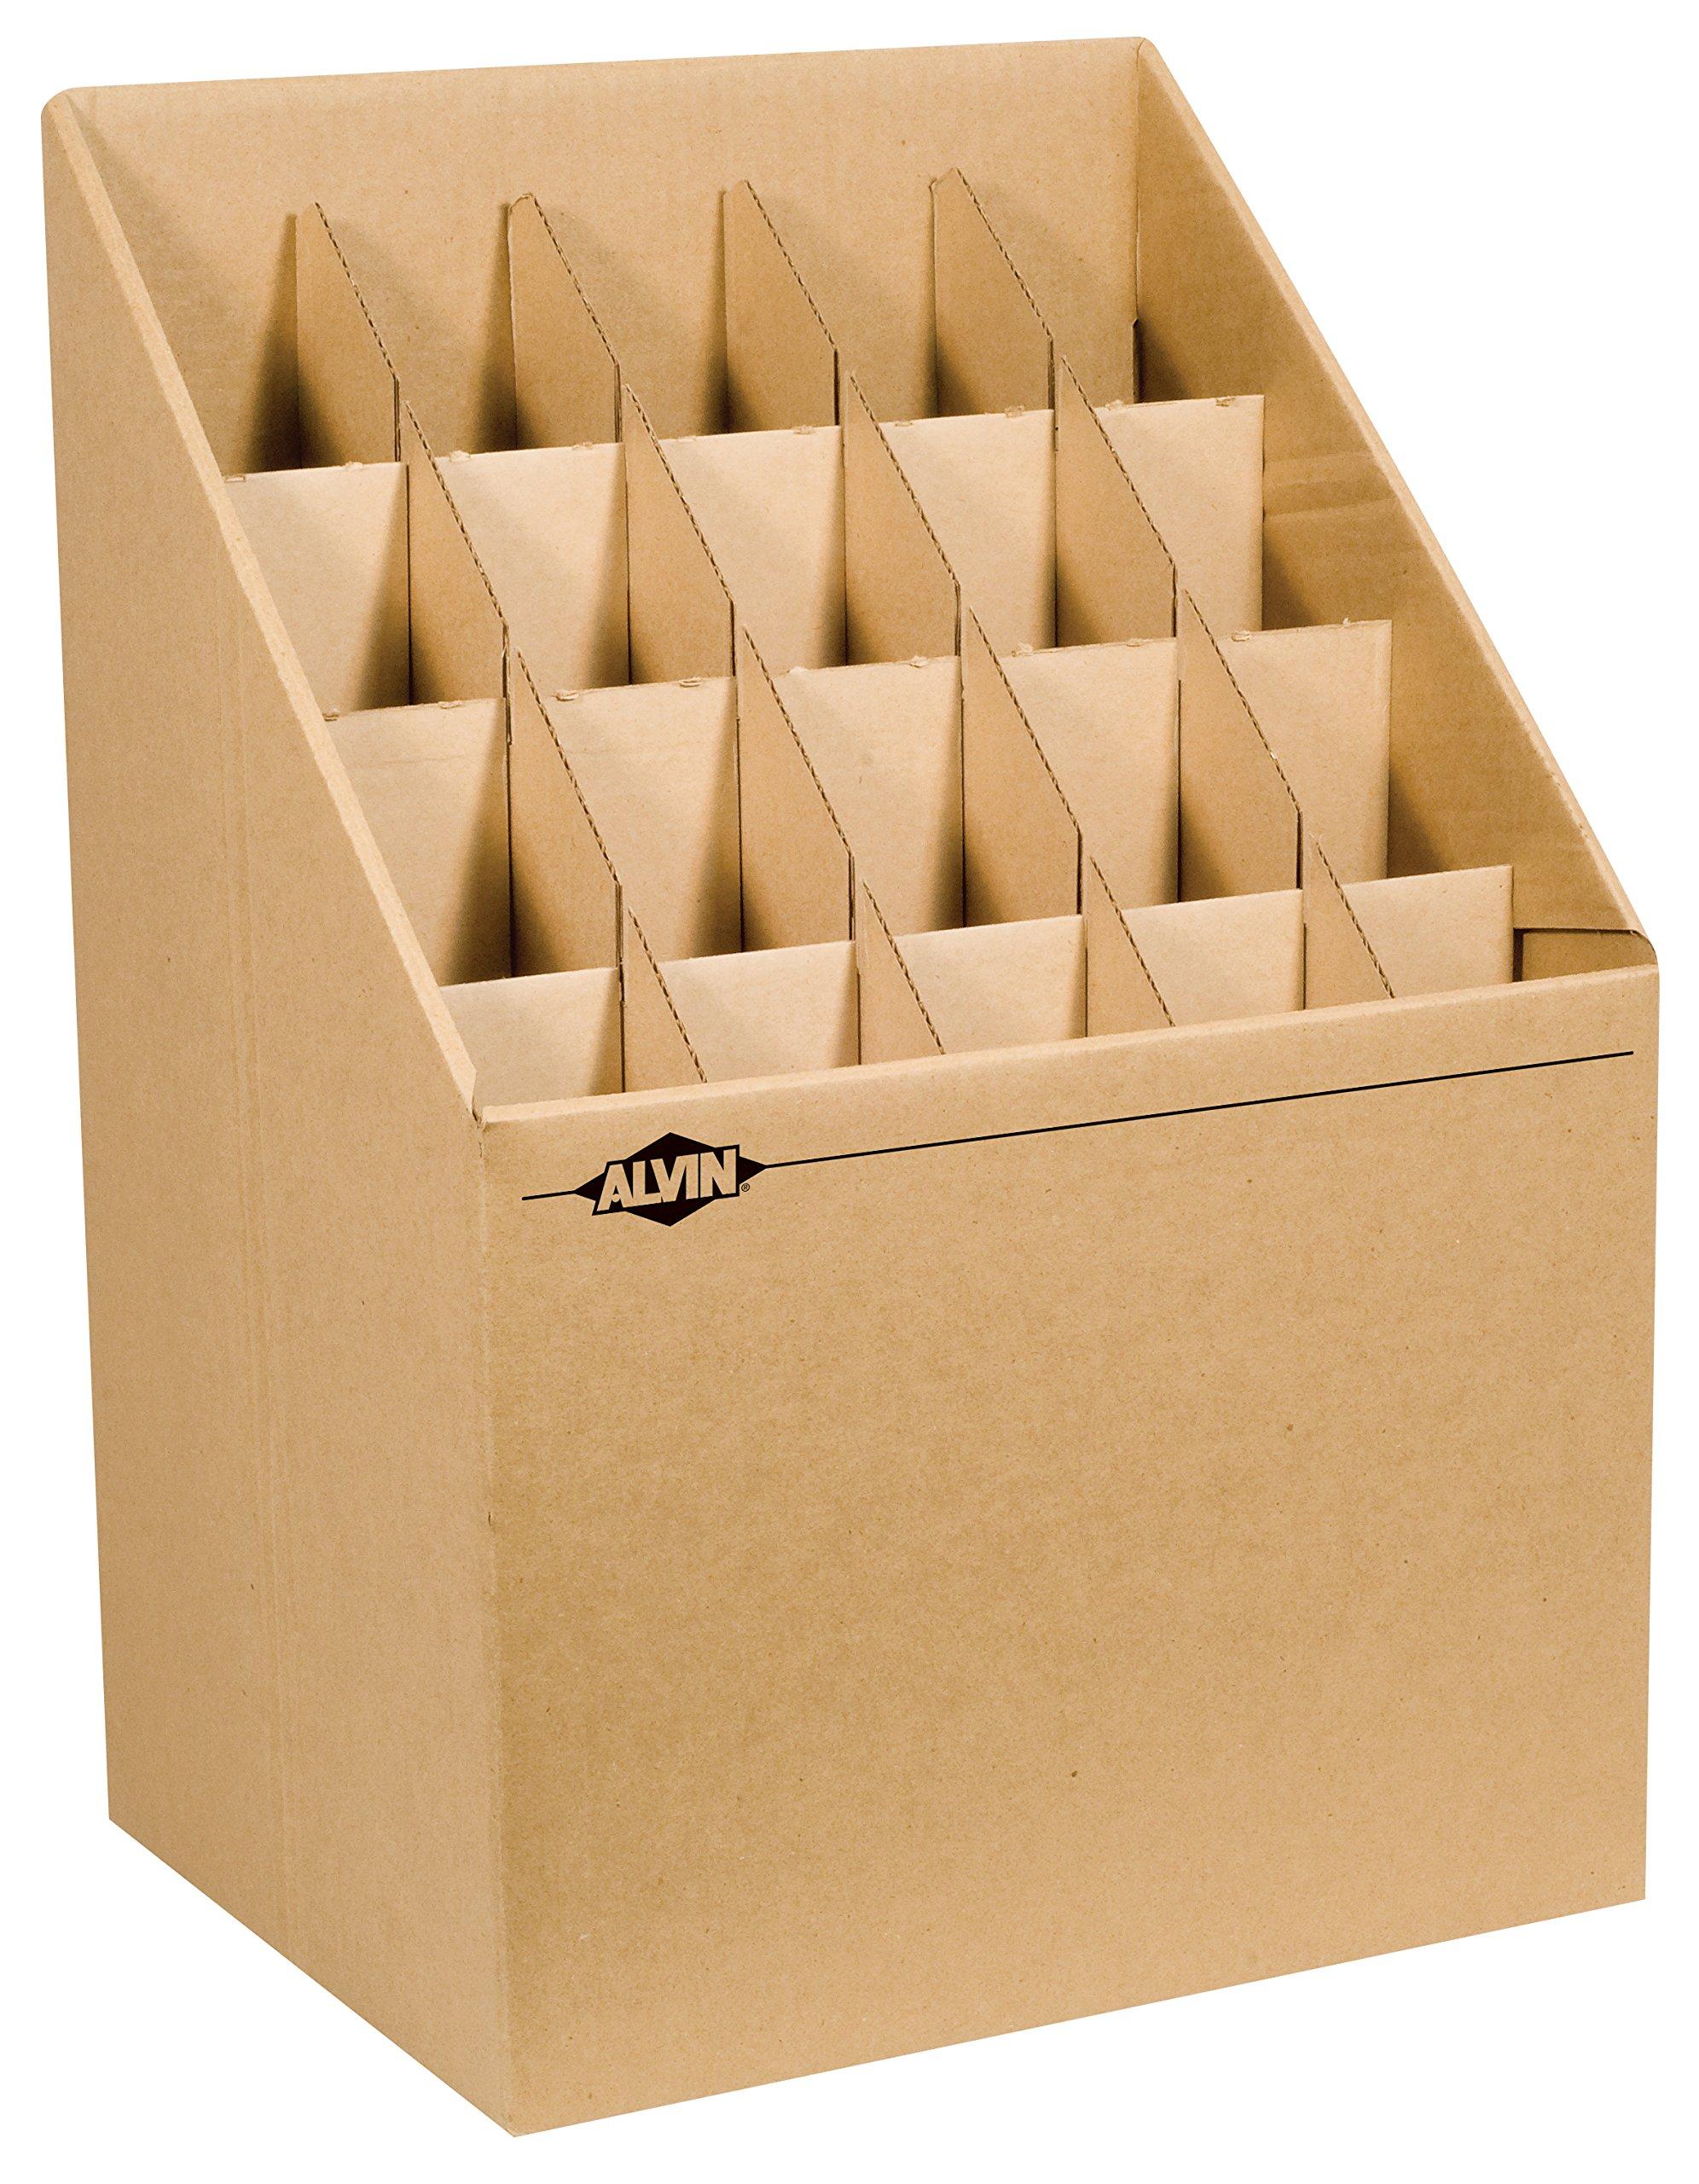 Alvin ARF12 Upright Roll File 12 Slots (20 Slots)